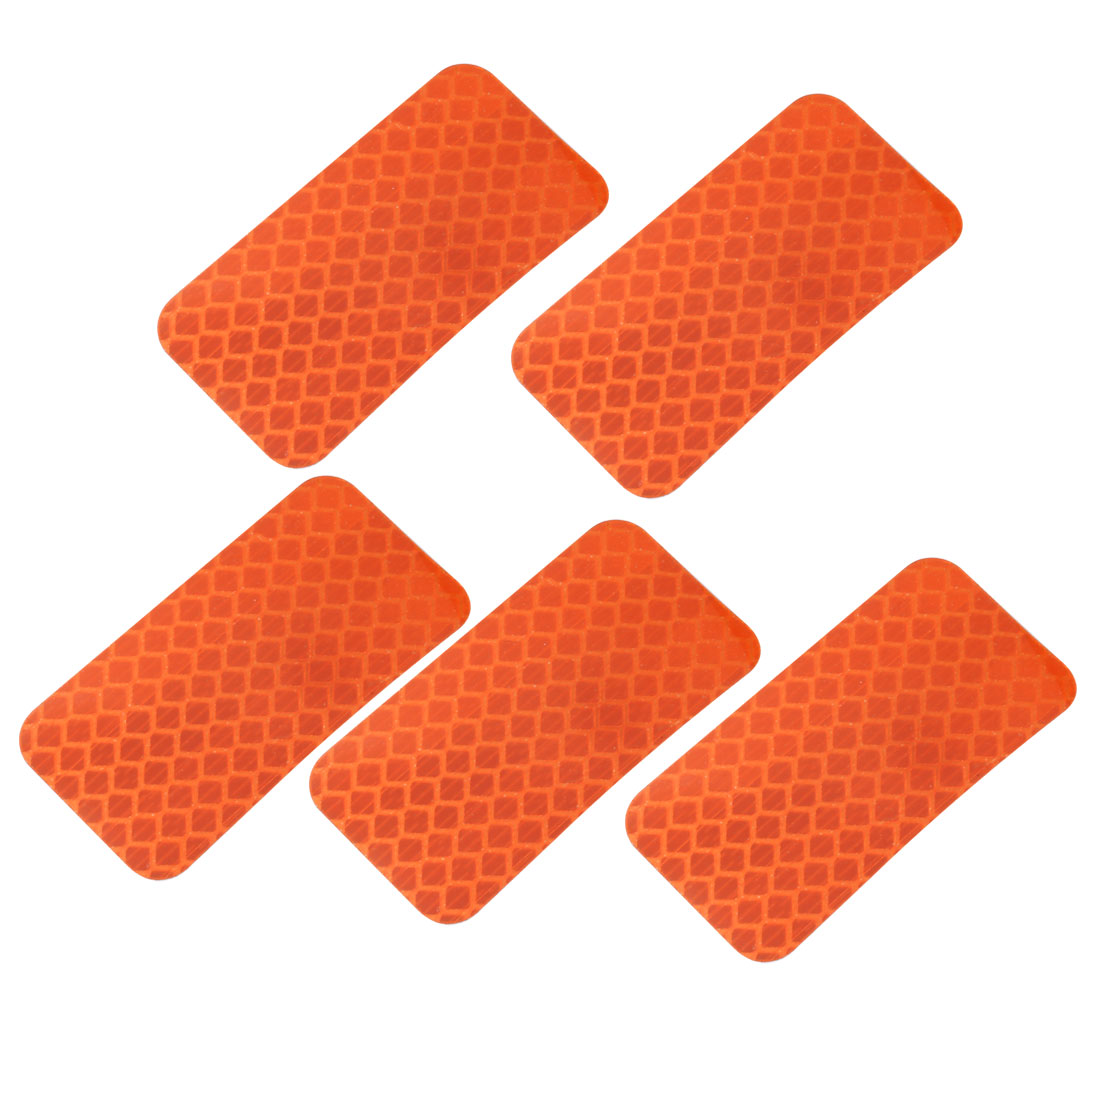 5pcs Honeycomb Reflective Warning Tape Film Sticker Orange 30mm x 60mm